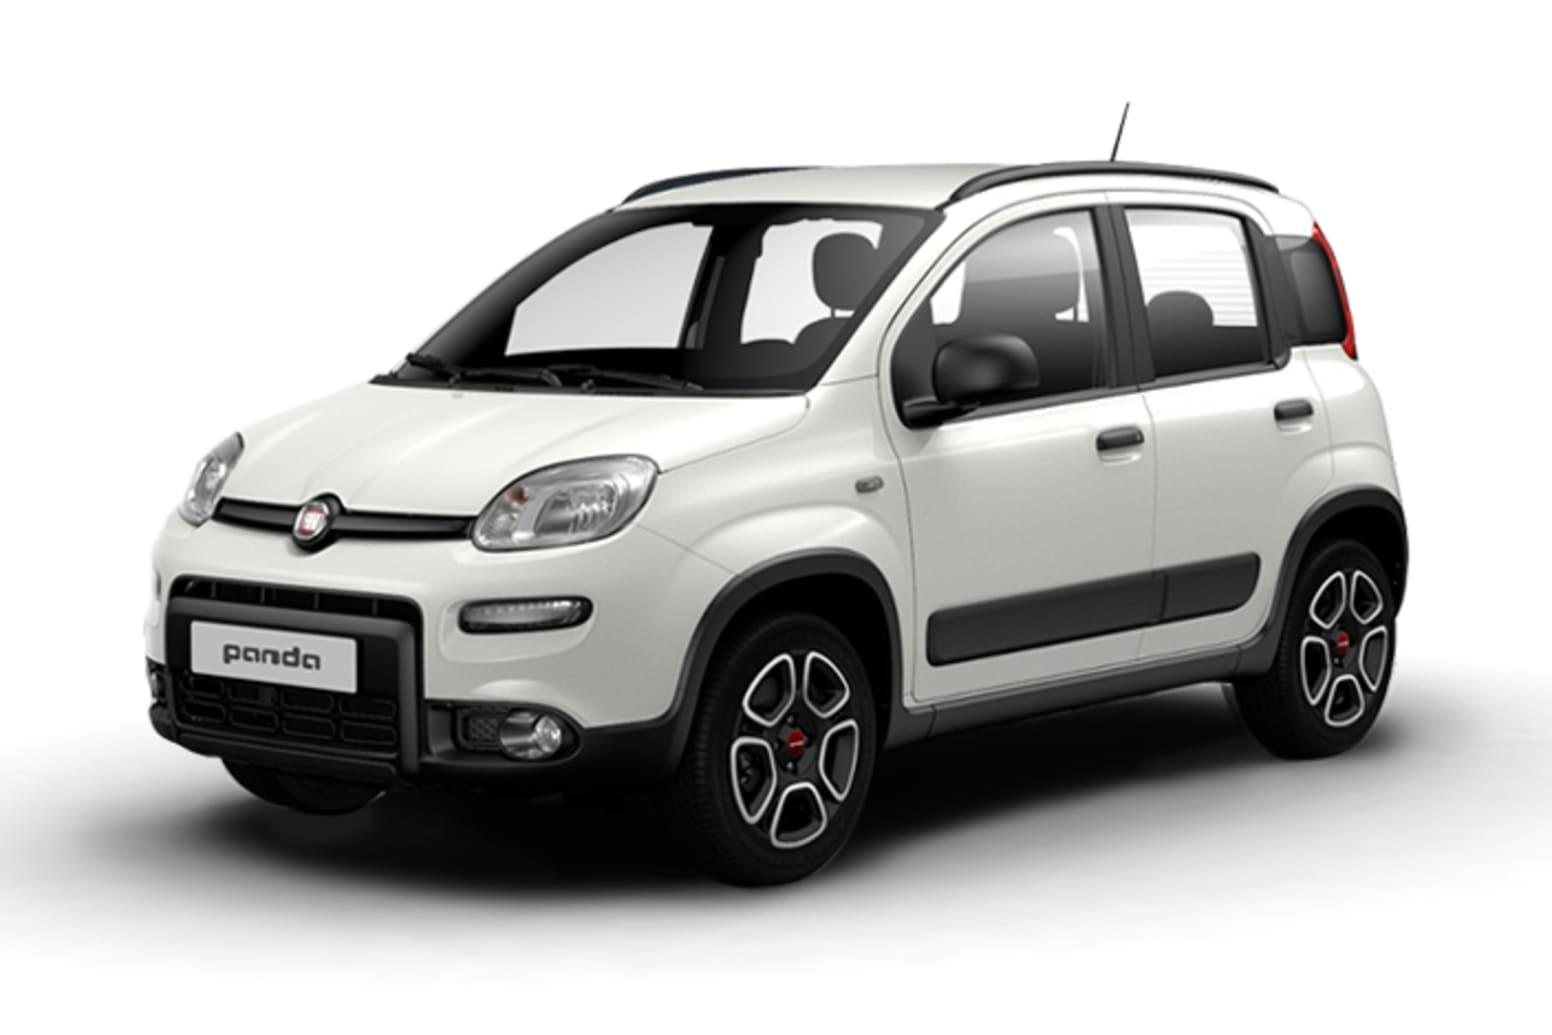 Fiat Panda 1.0 City Life Hybrid